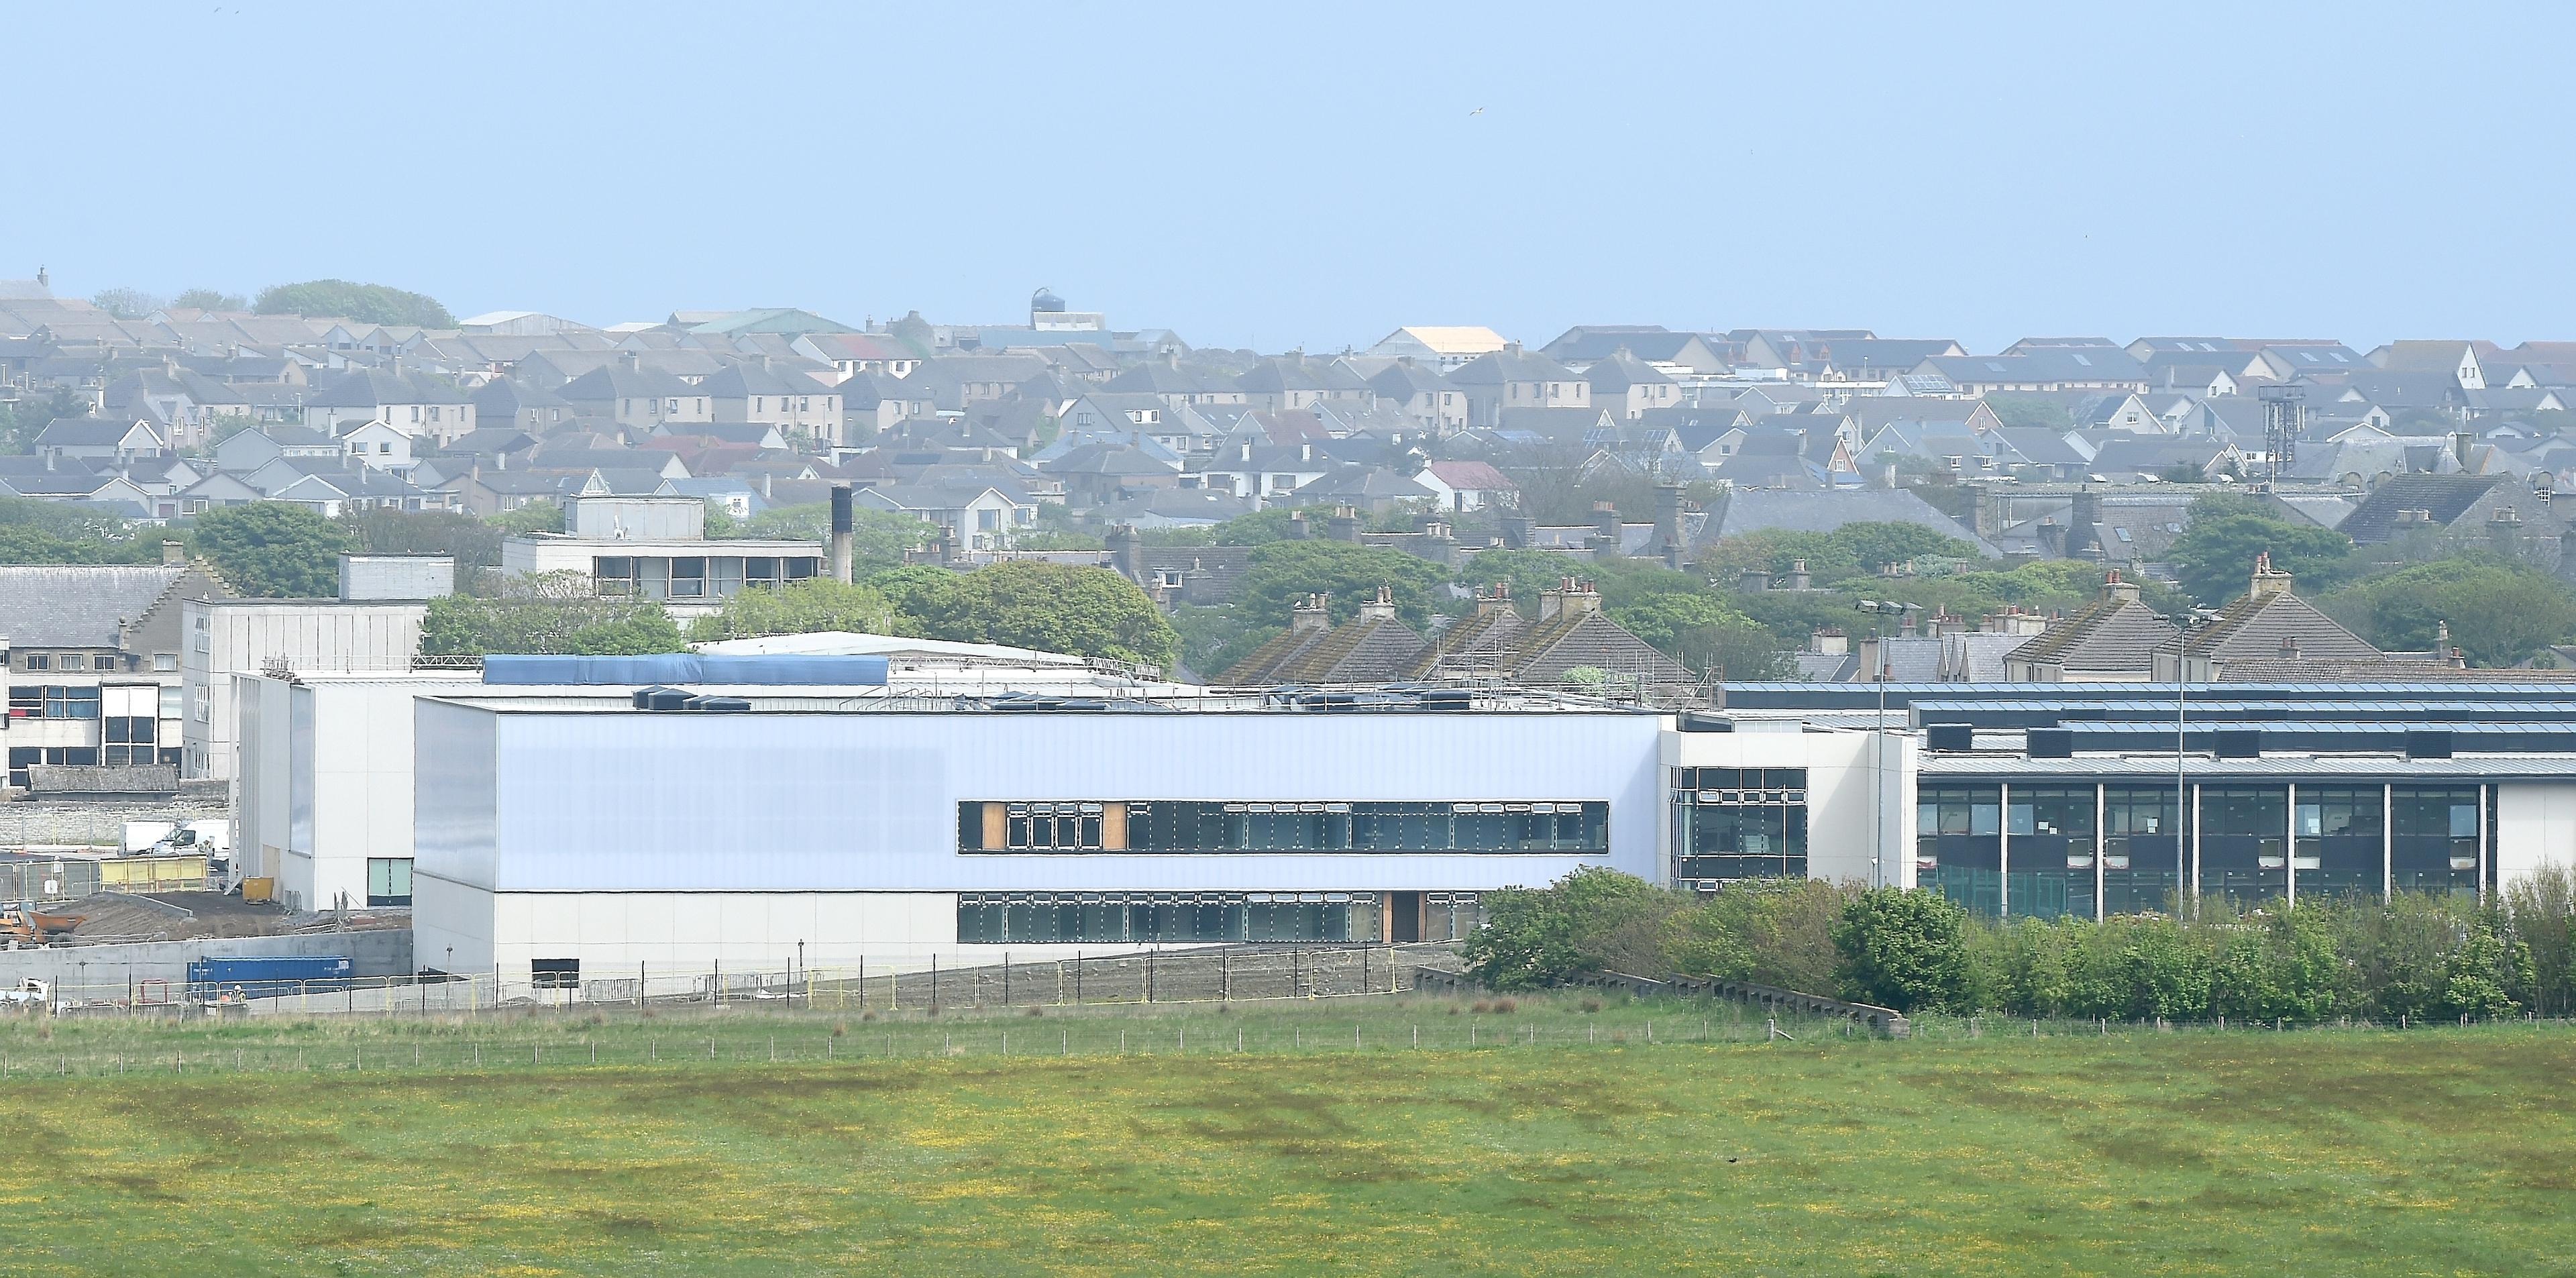 The new Wick High School